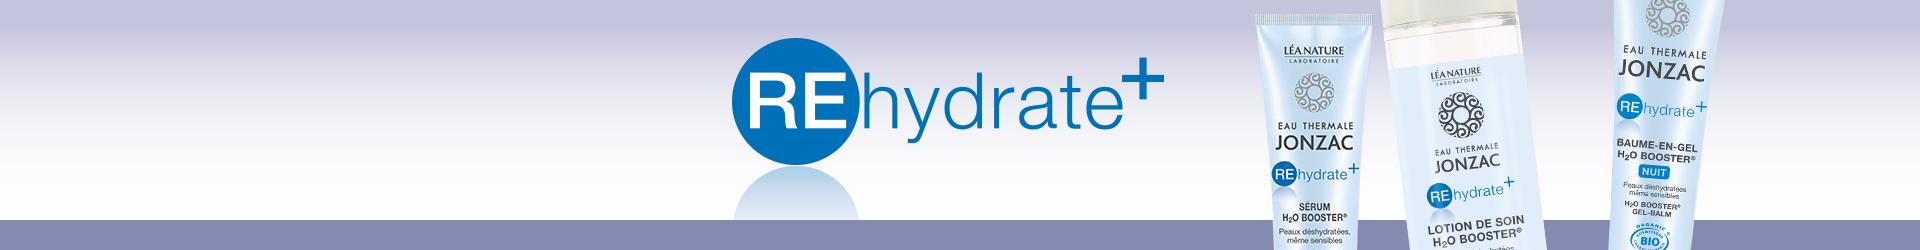 rehydrate-plus-jonzac-hydrate-moisturize-thermal-water